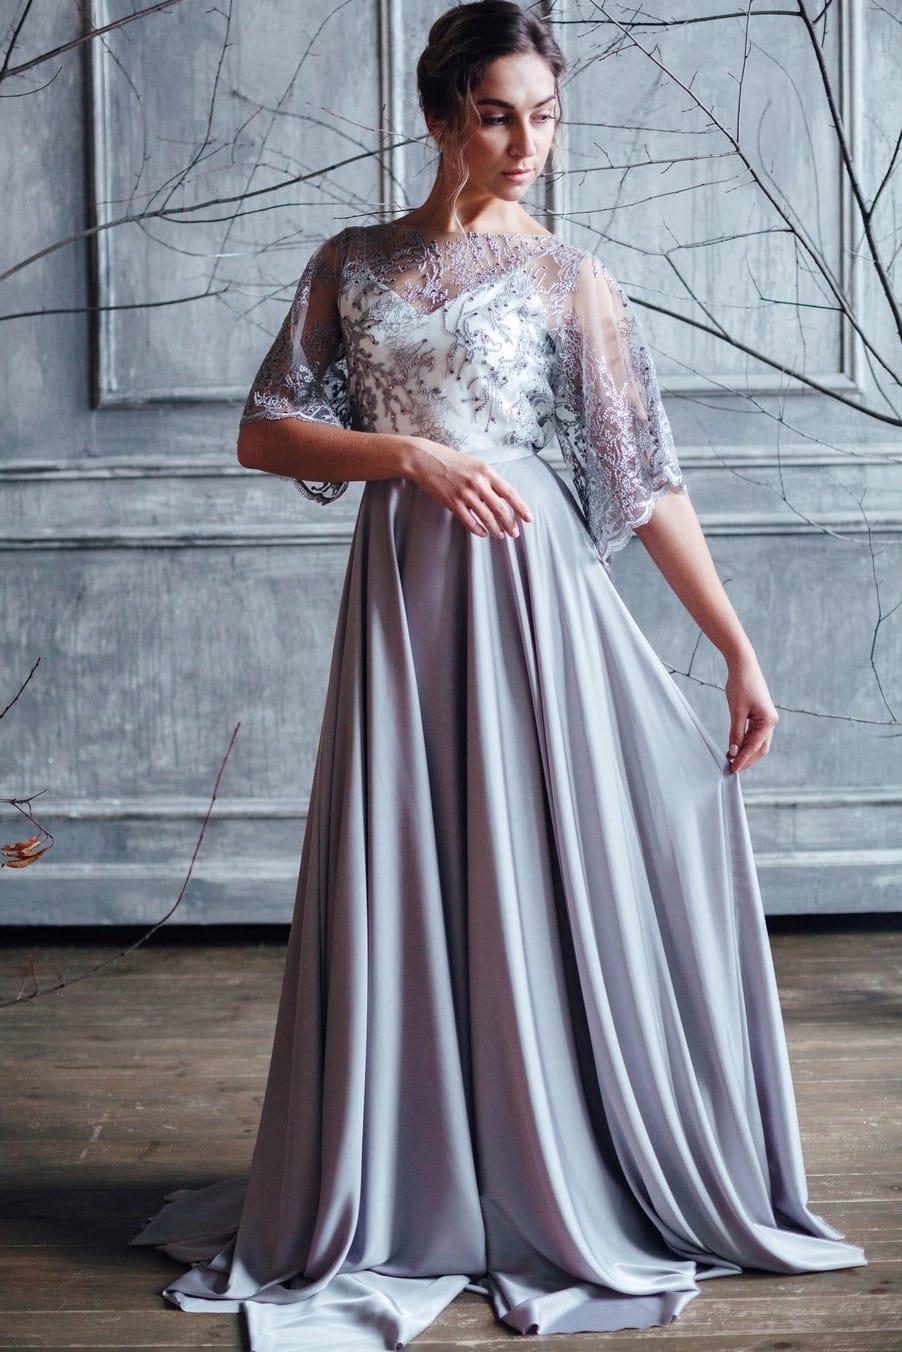 Вечернее платье MIKA, коллекция FLOWER MAGIC, бренд RARE BRIDAL, фото 1